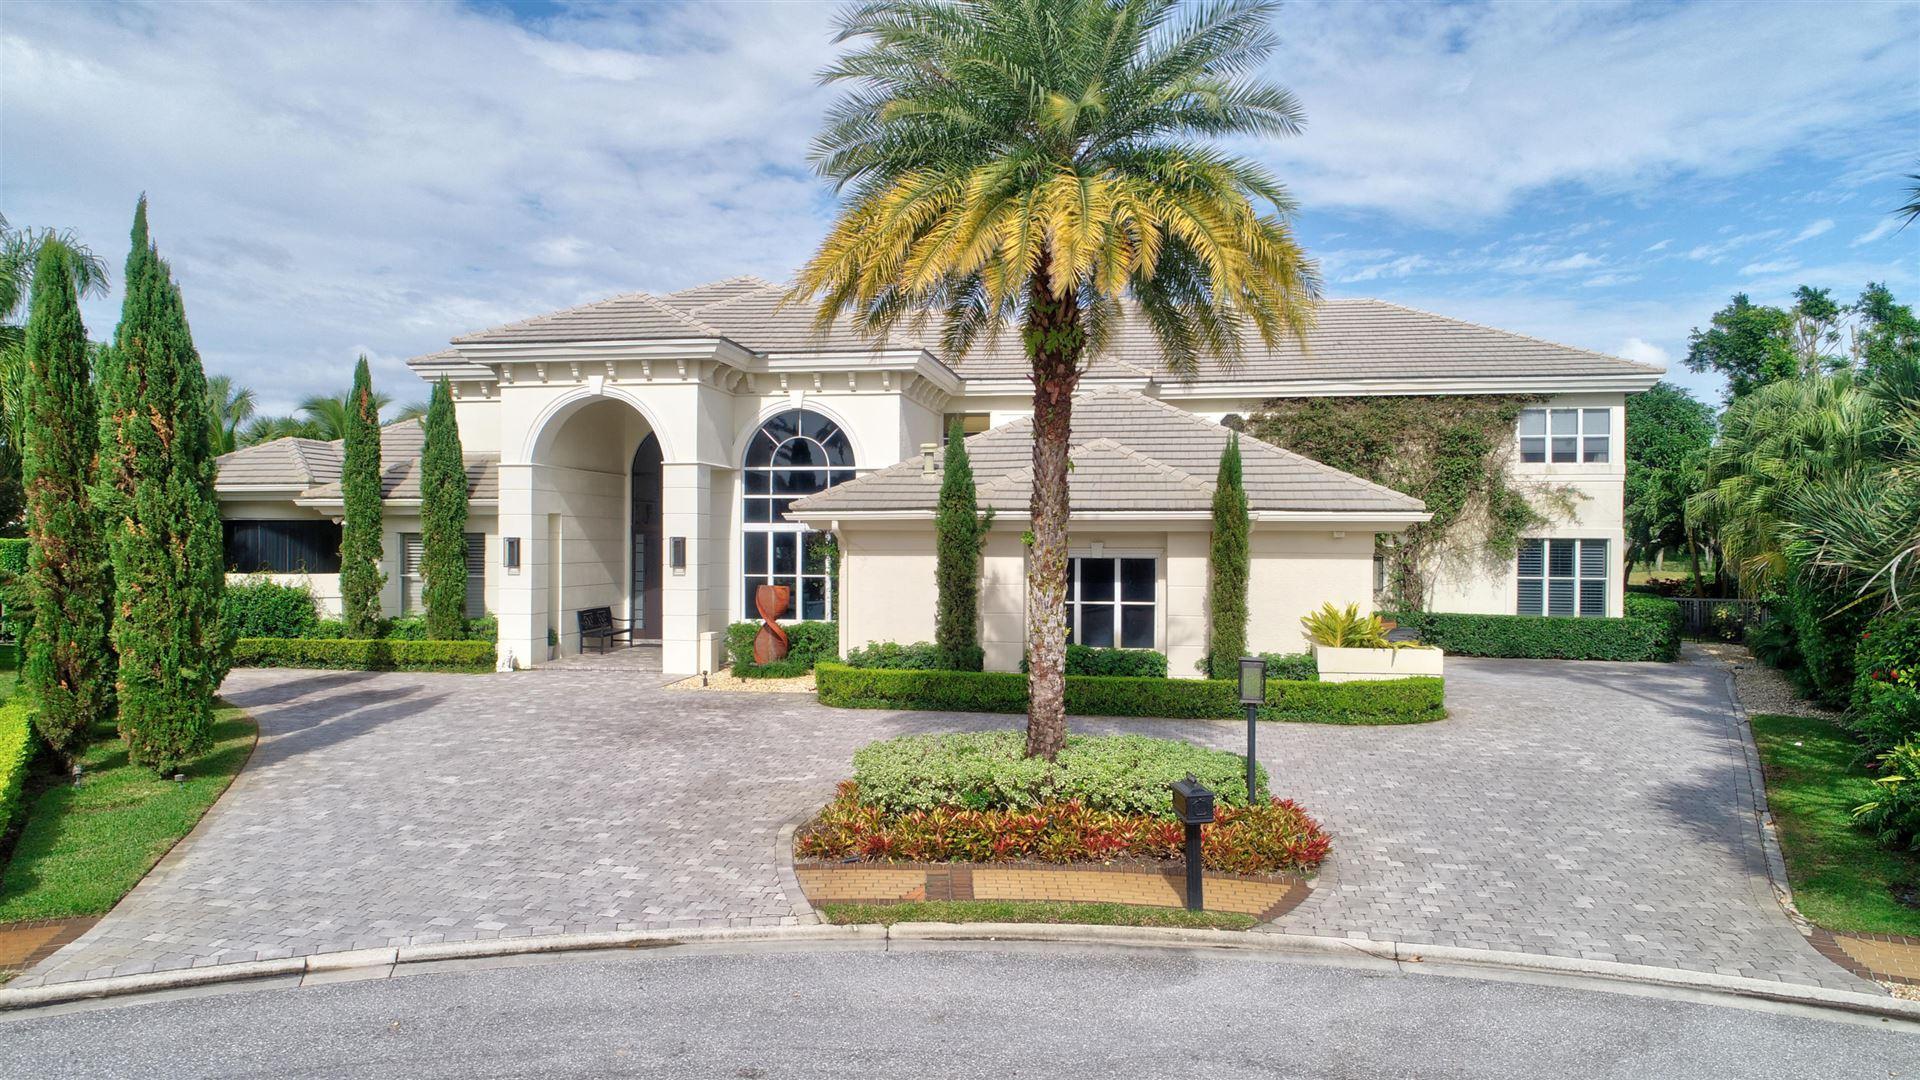 17048 Castlebay Court, Boca Raton, FL 33496 - #: RX-10676170